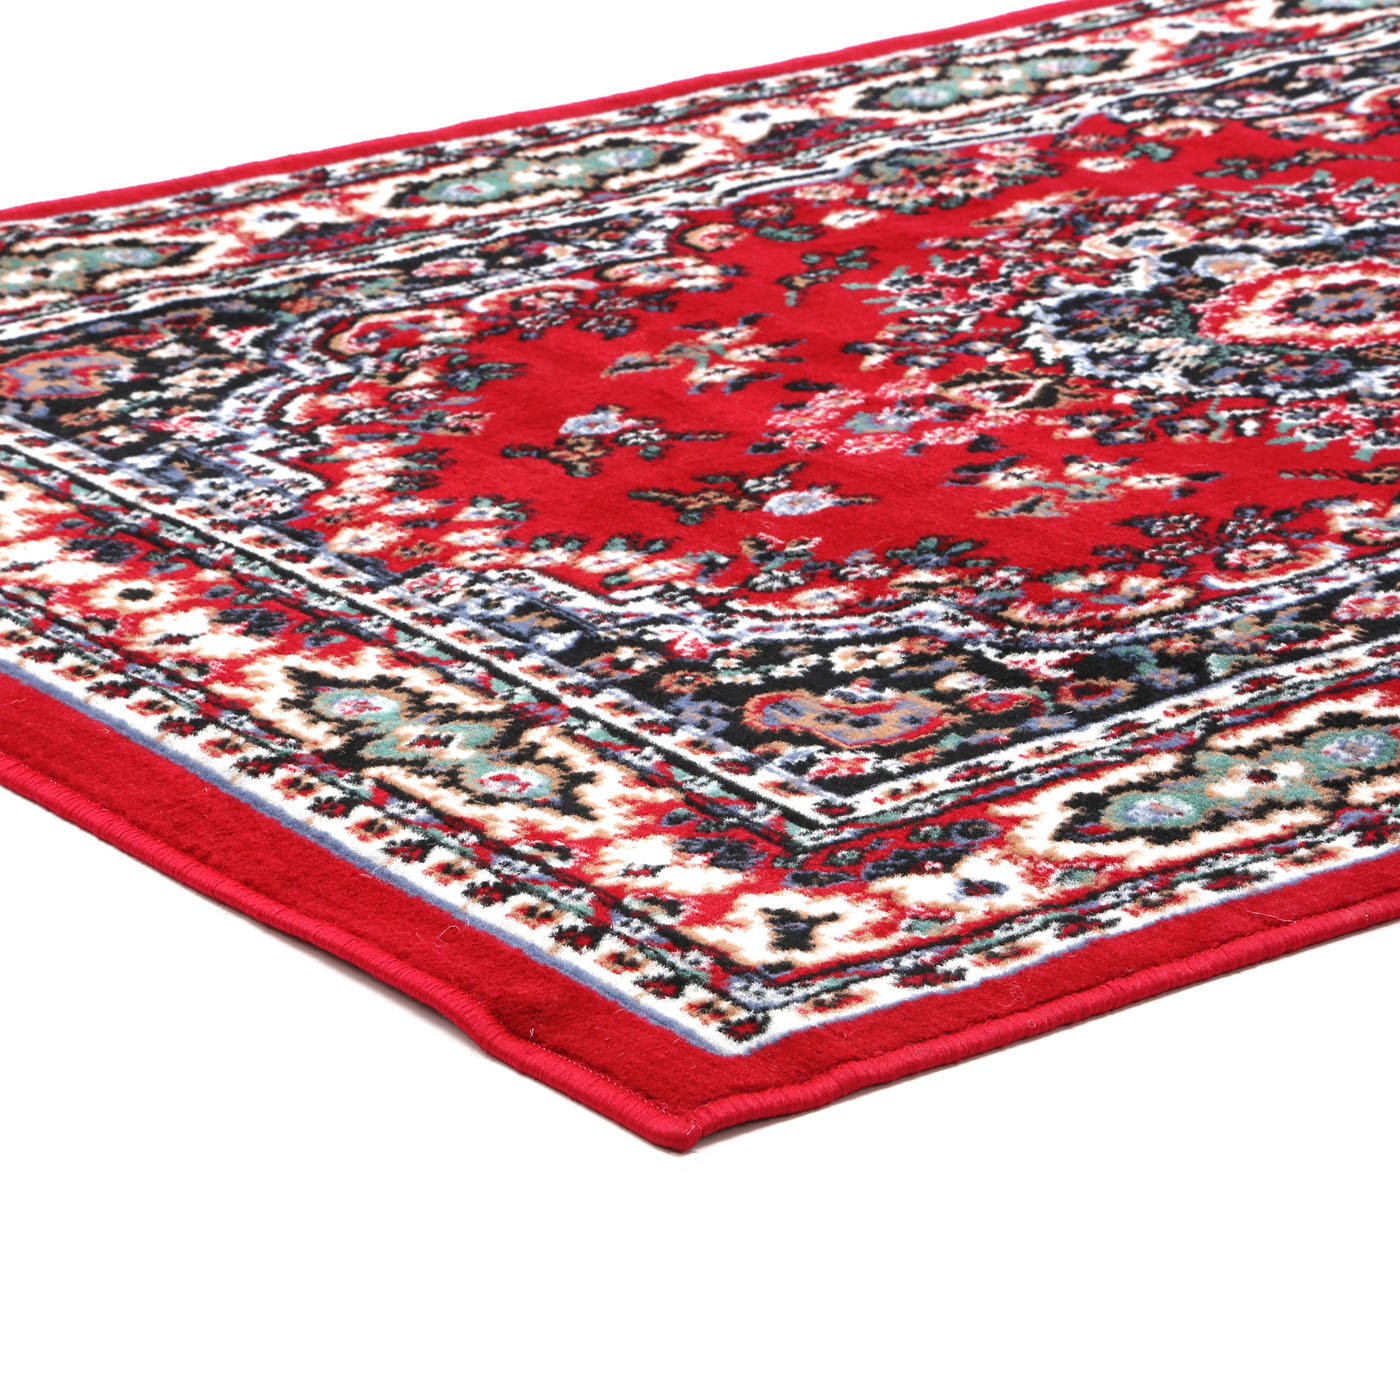 ugs rea ugs arpet Flooring Persian rea ug Oriental Floor ... - ^